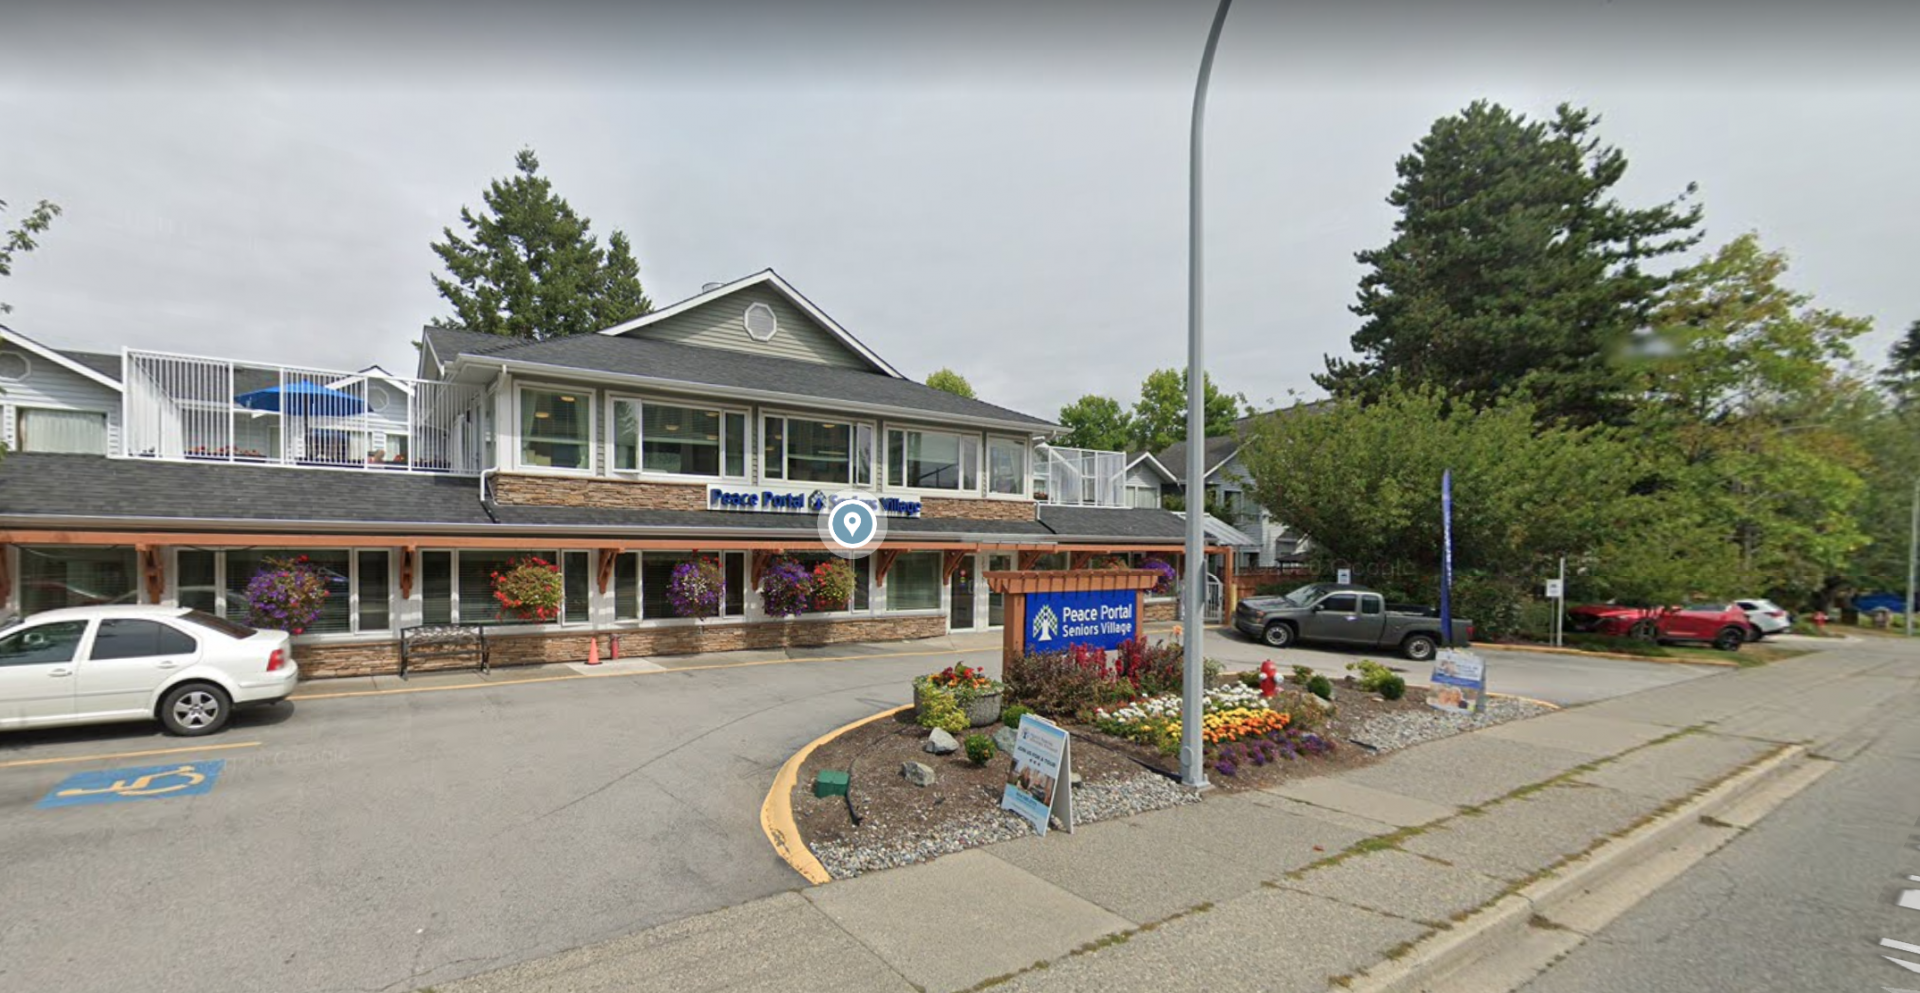 Coronavirus case confirmed at Surrey senior's village